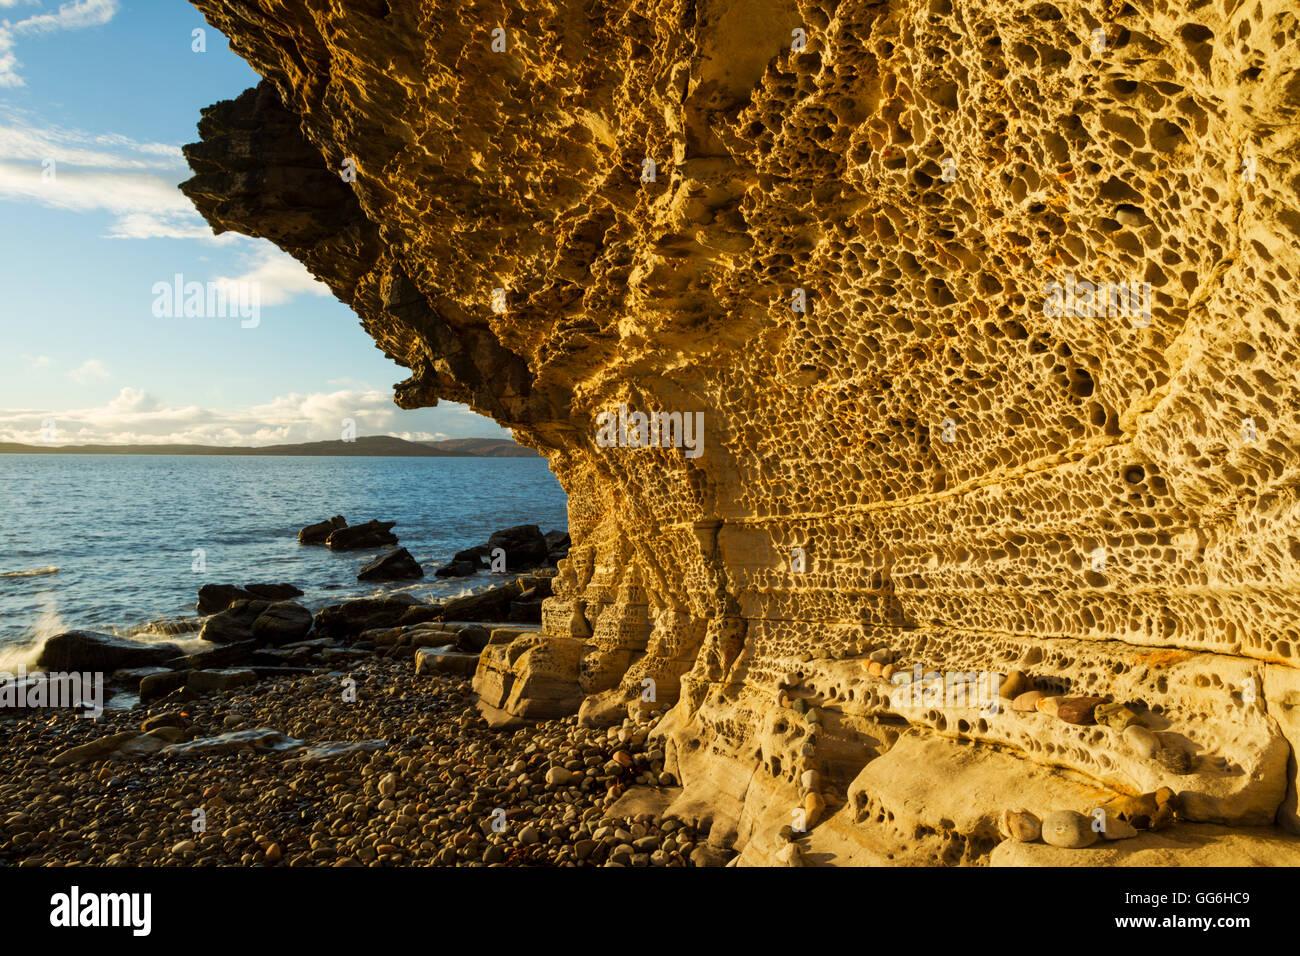 Undercutting Stock Photos & Undercutting Stock Images - Alamy